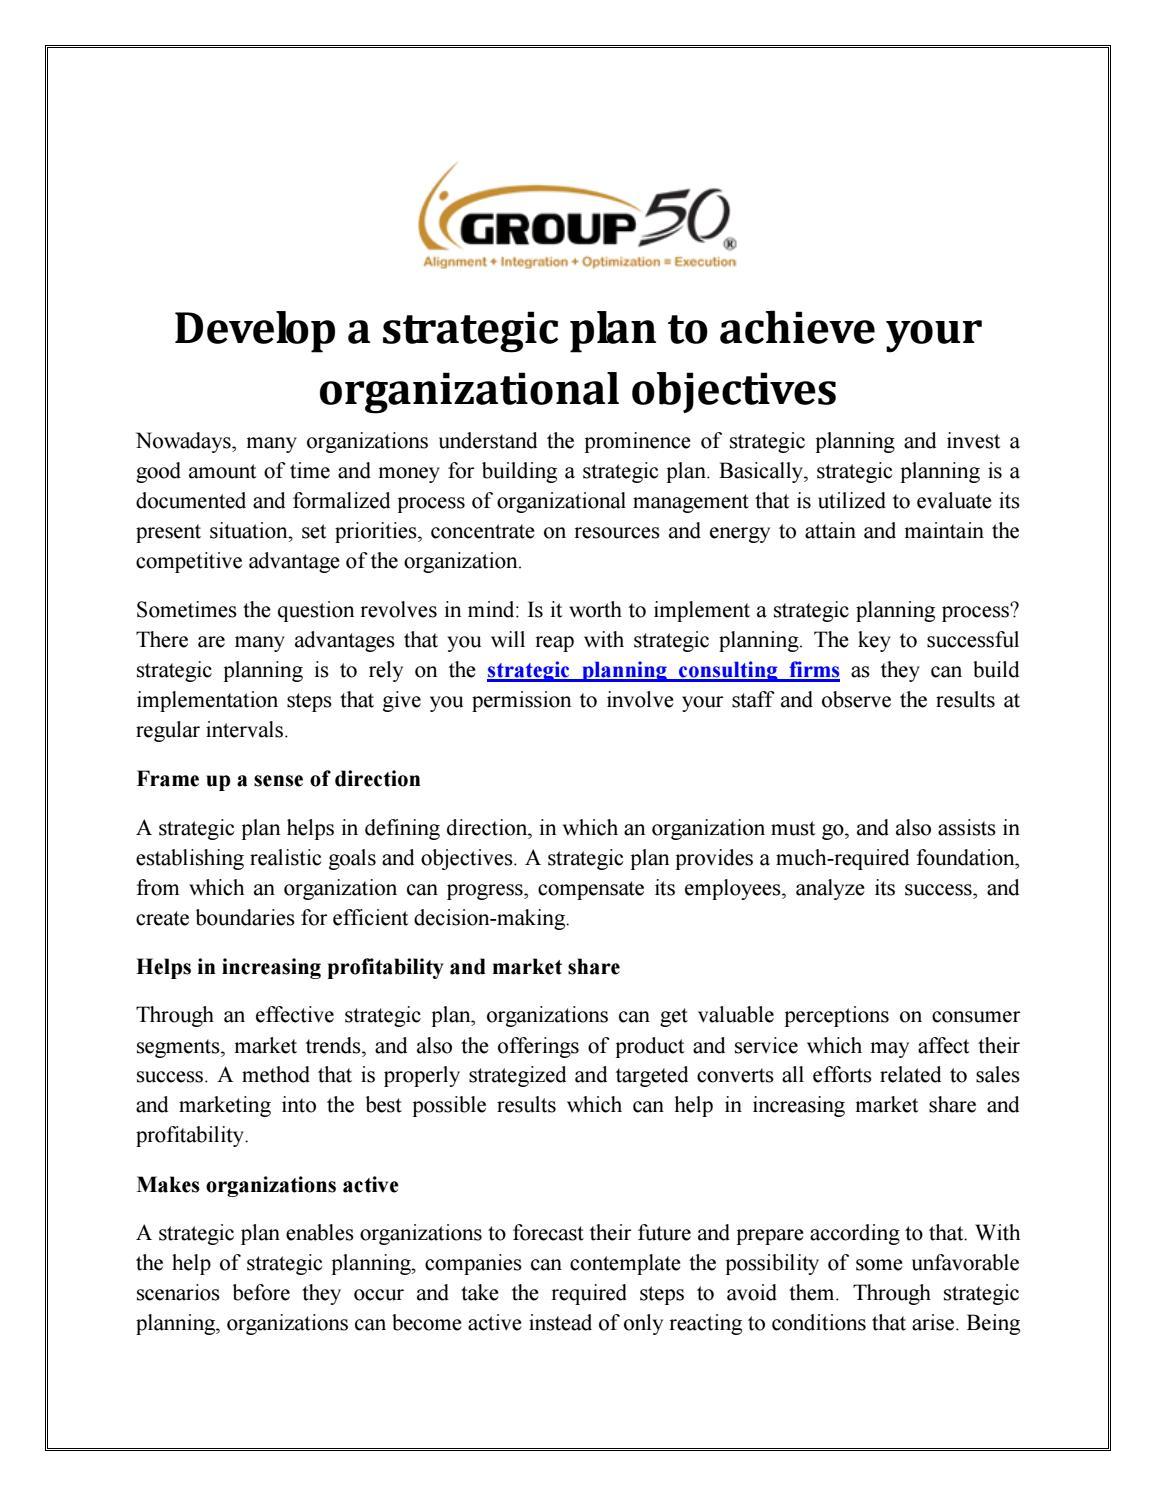 Develop a strategic plan to achieve your organizational